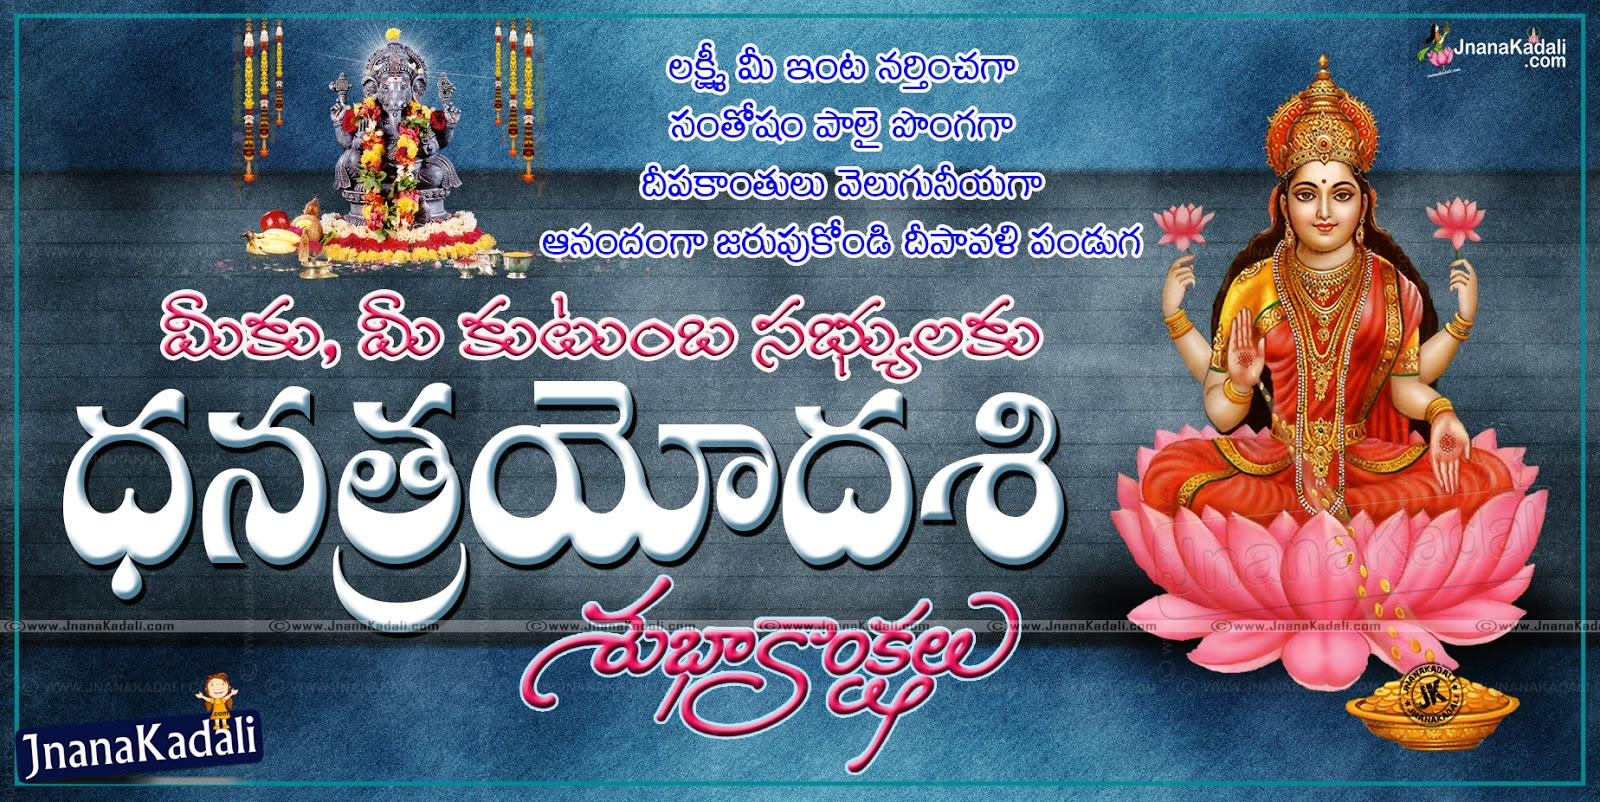 Best Telugu Dhanatrayodashi Wishes Jnana Kadali Com